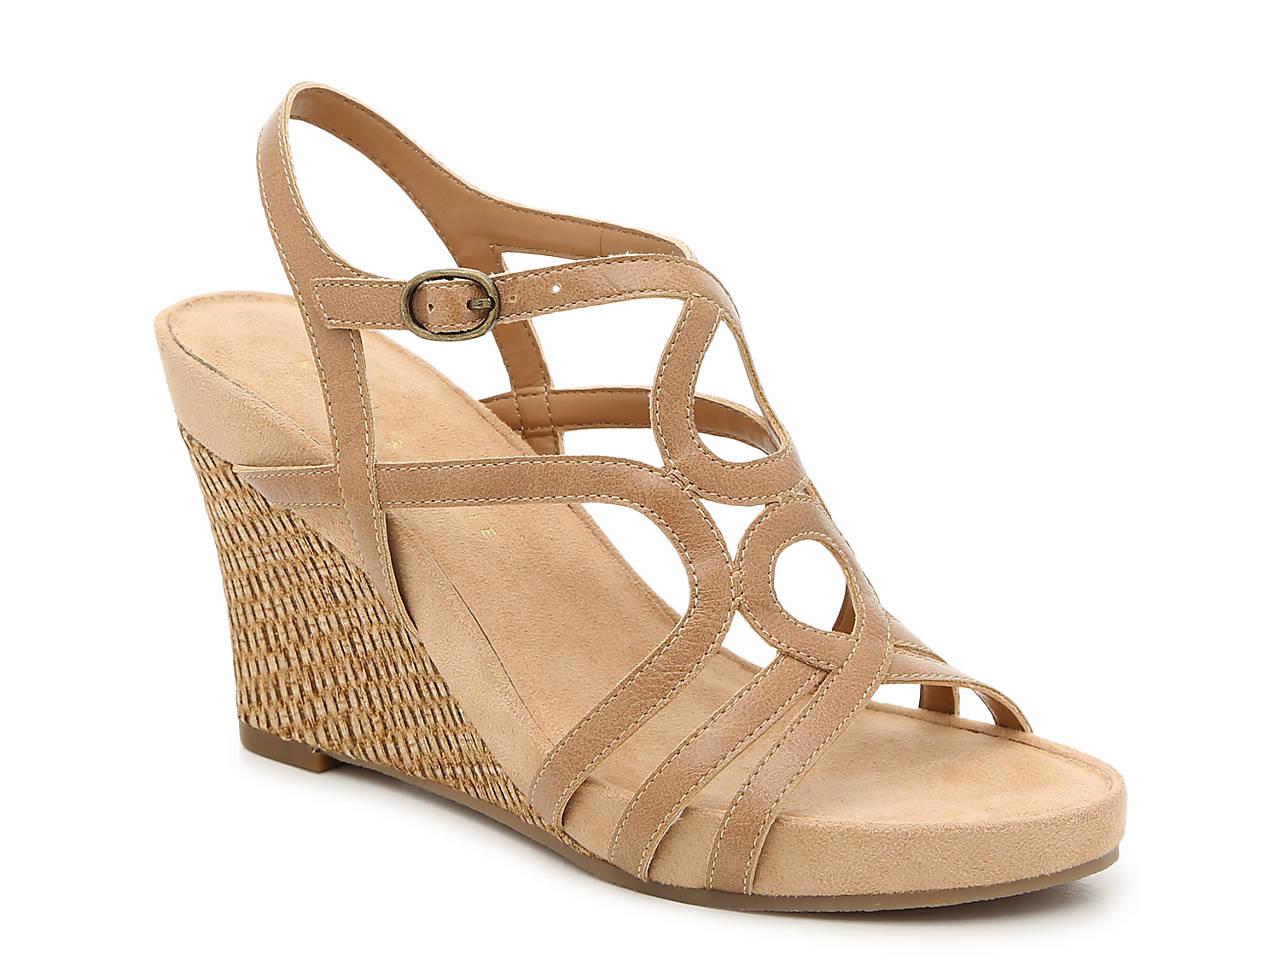 7e4e1d585df Kelly   Katie Plushin Wedge Sandal Women s Shoes